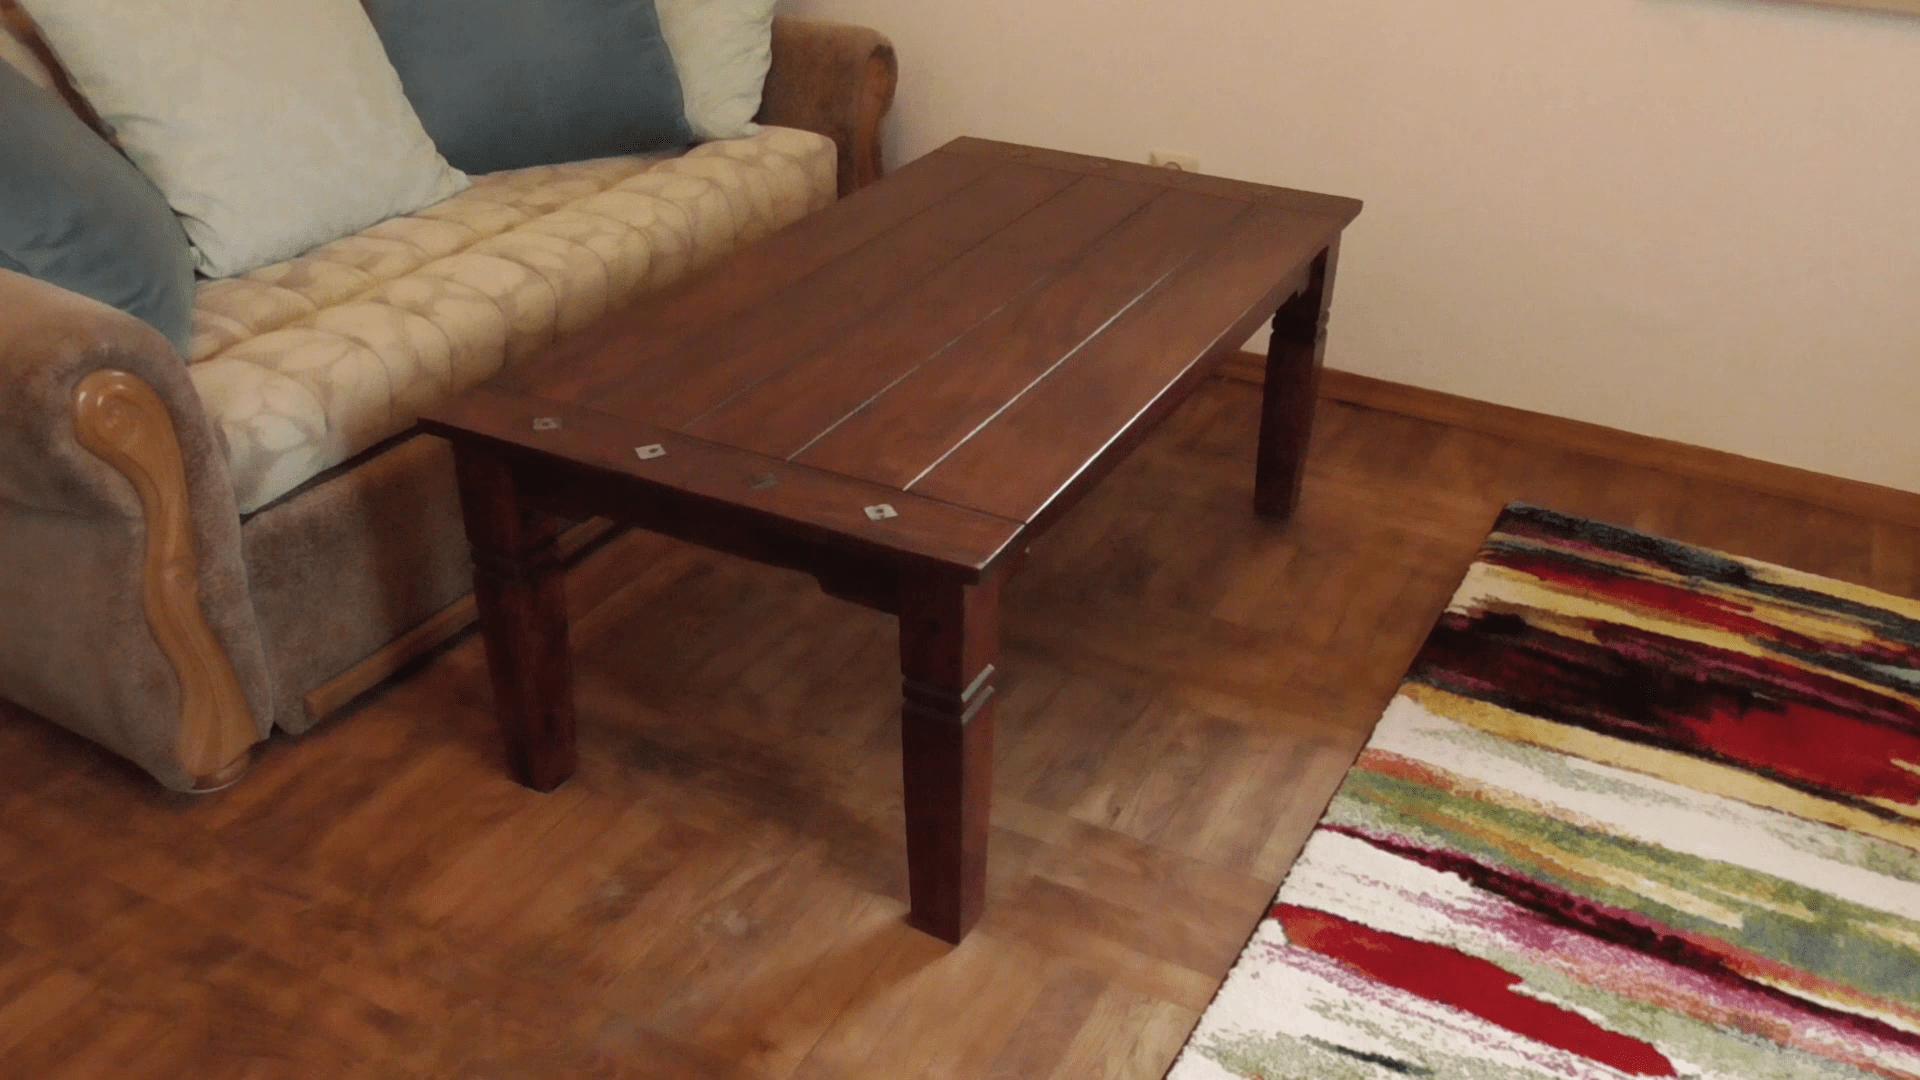 Montaż stolika